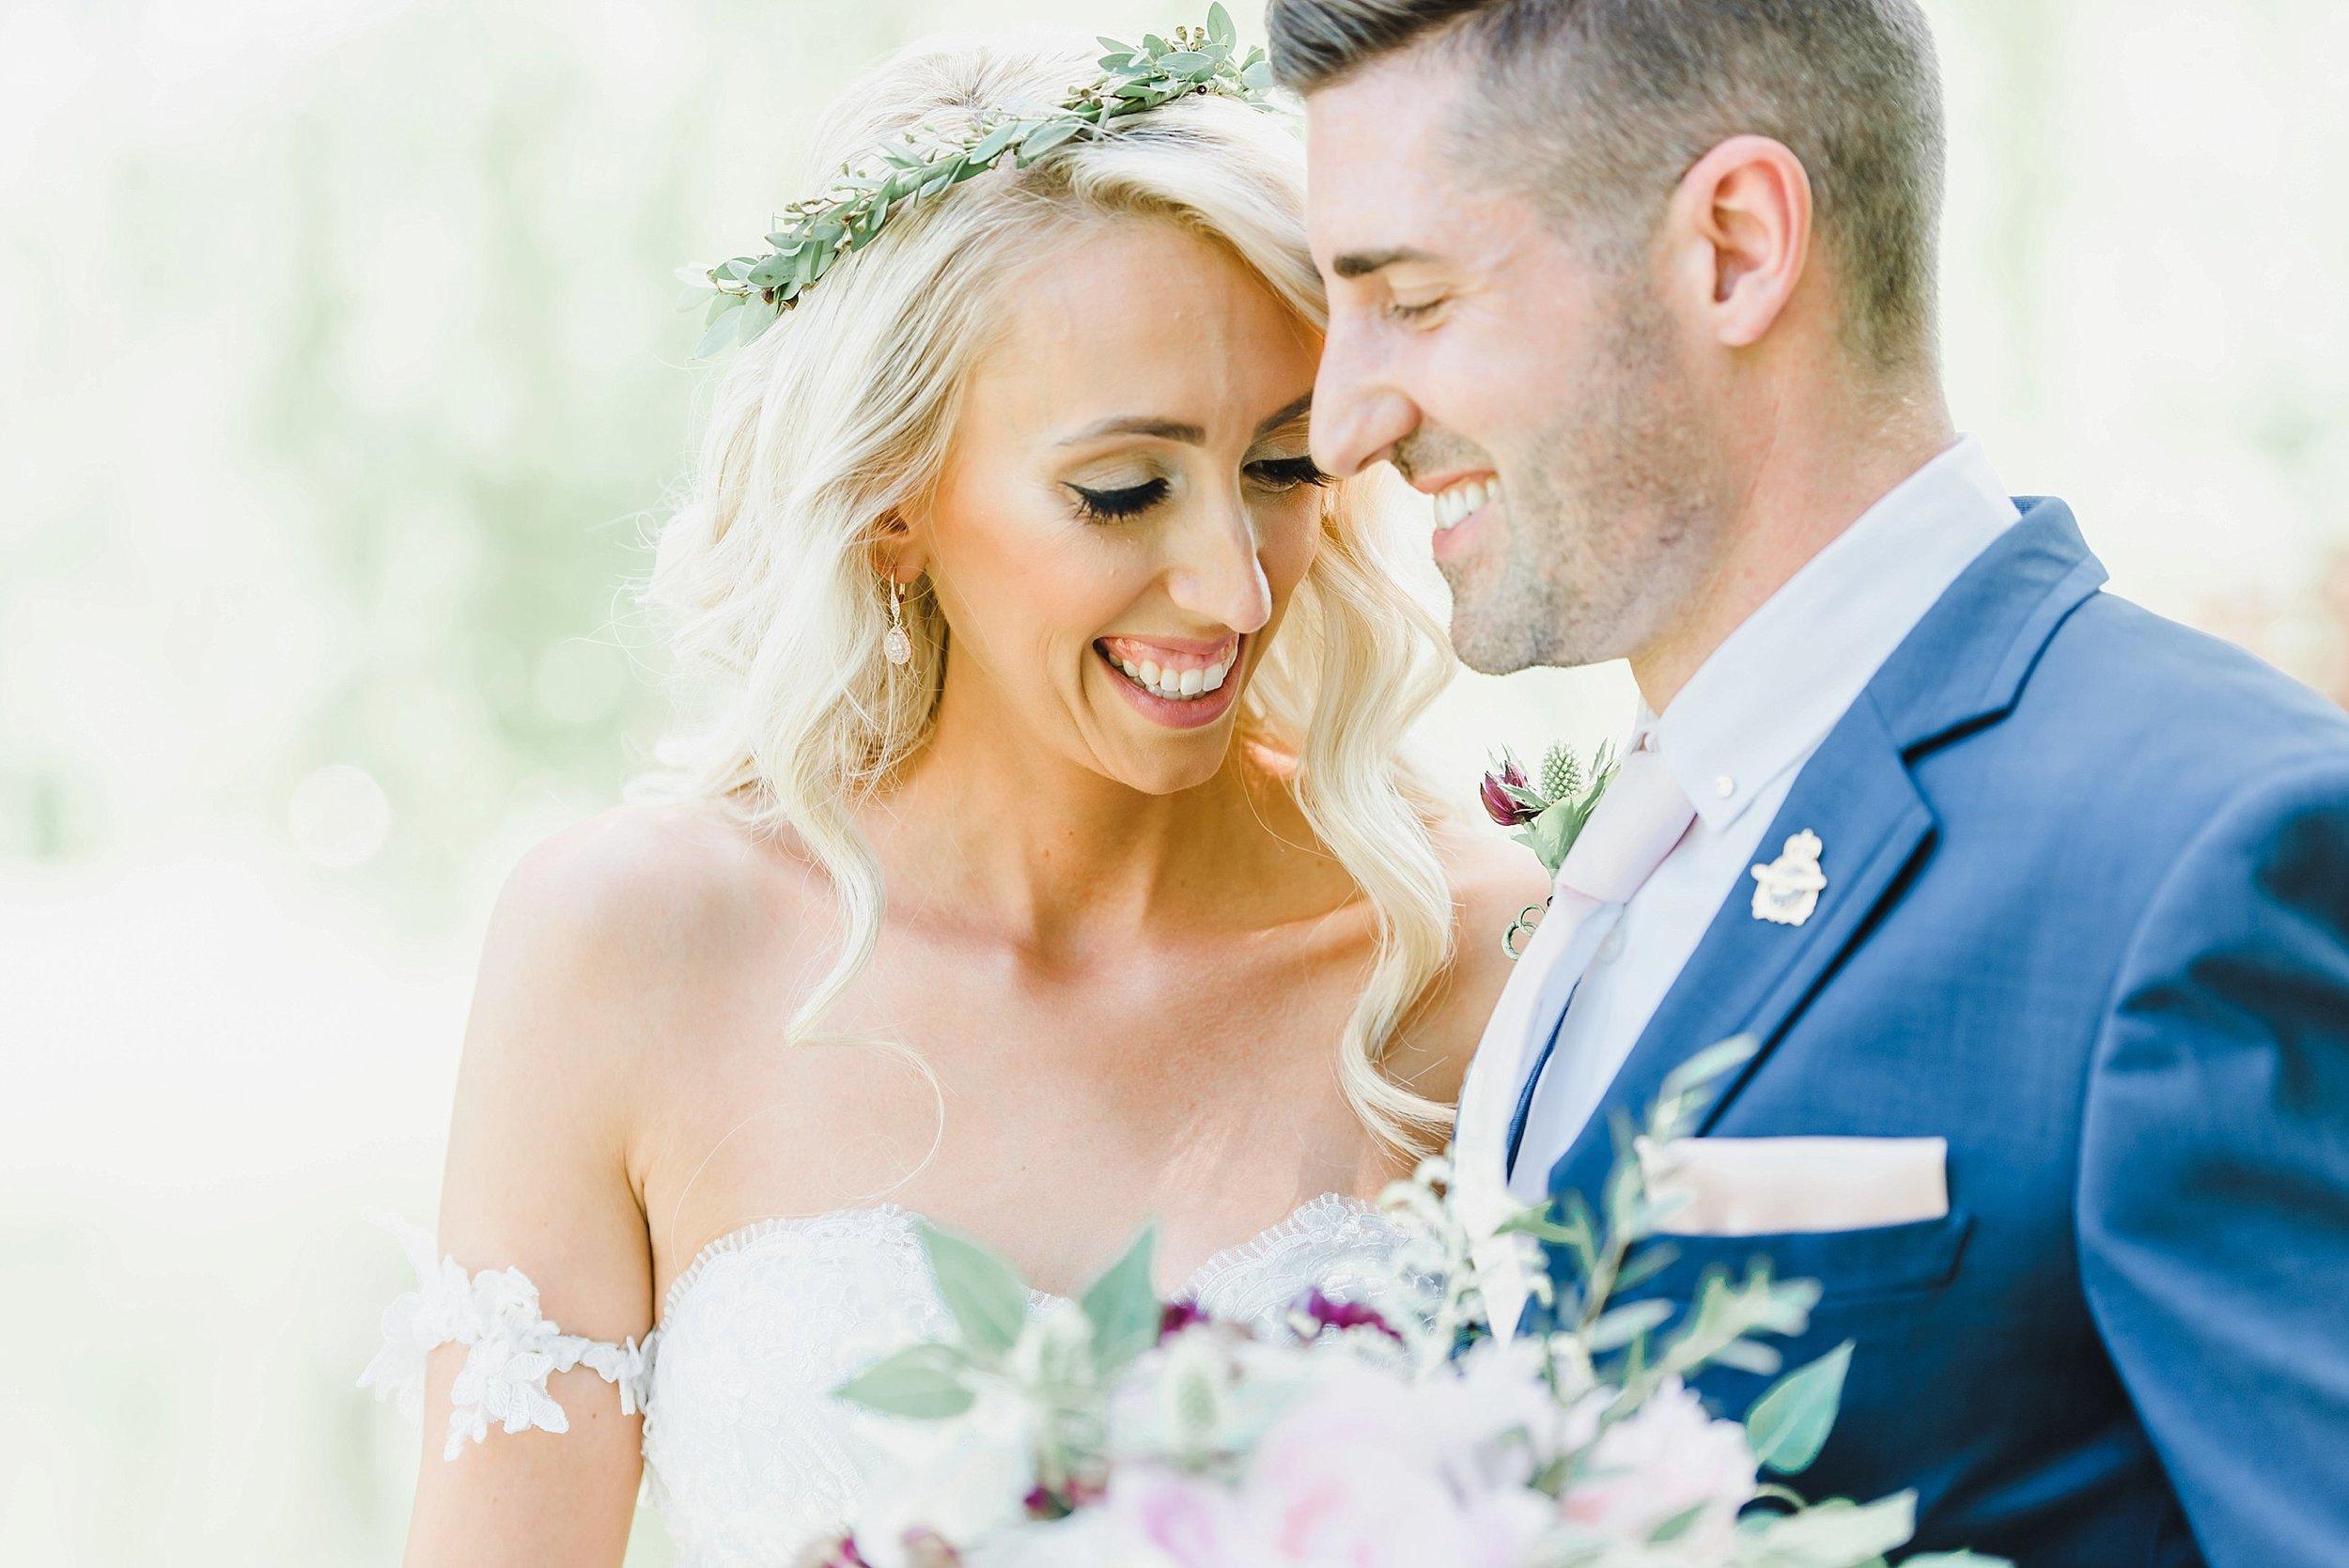 light airy indie fine art ottawa wedding photographer | Ali and Batoul Photography_0042.jpg